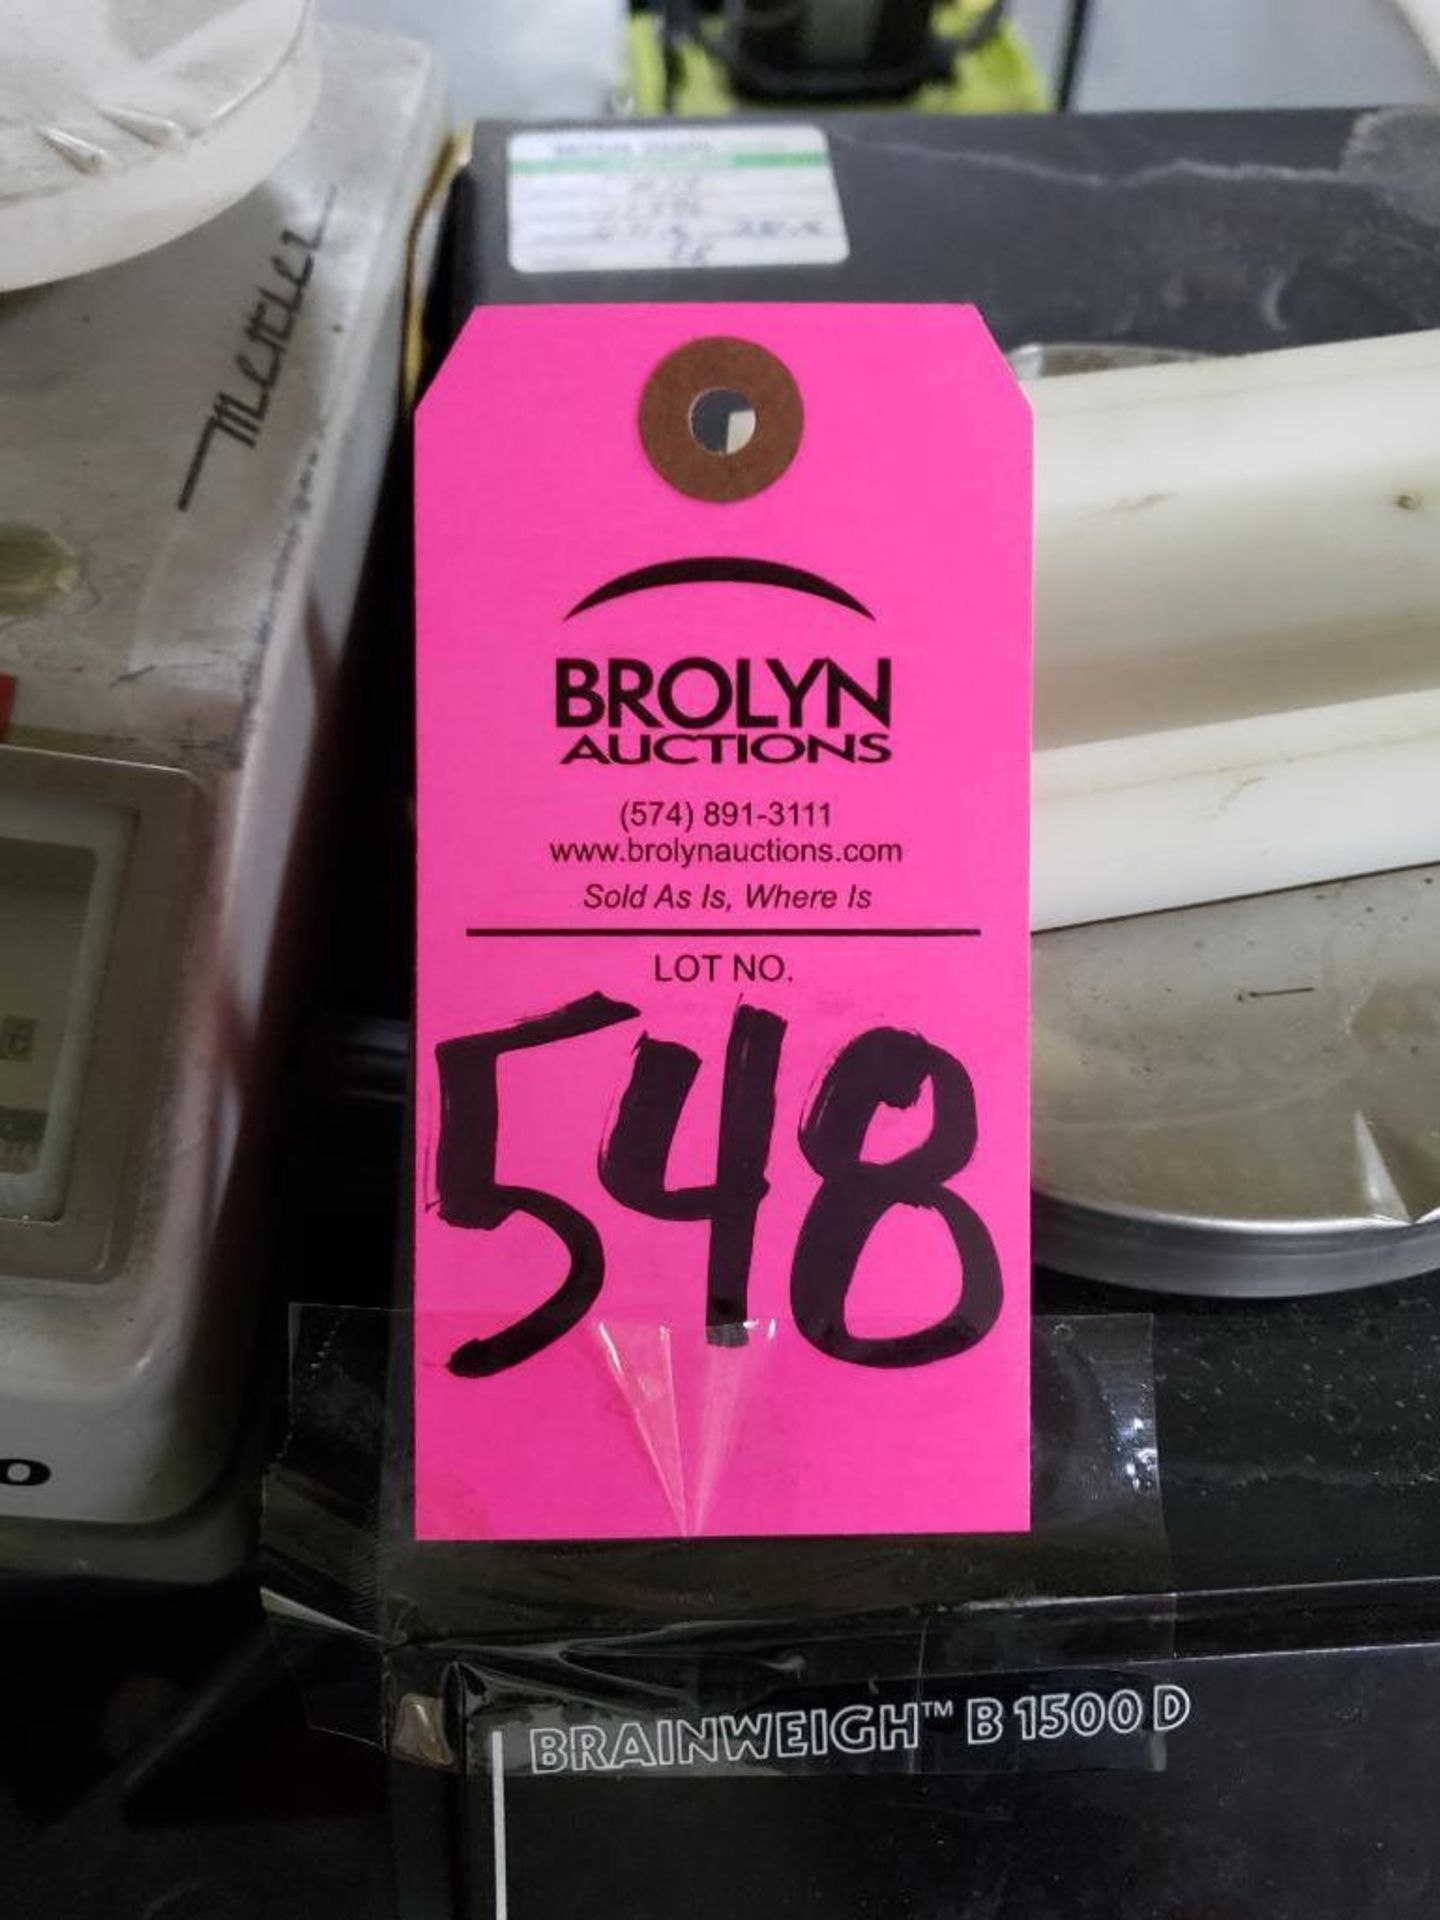 Lot 548 - Qty 2 - Mettler Toledo E200 and Brainweigh B1500D scales.